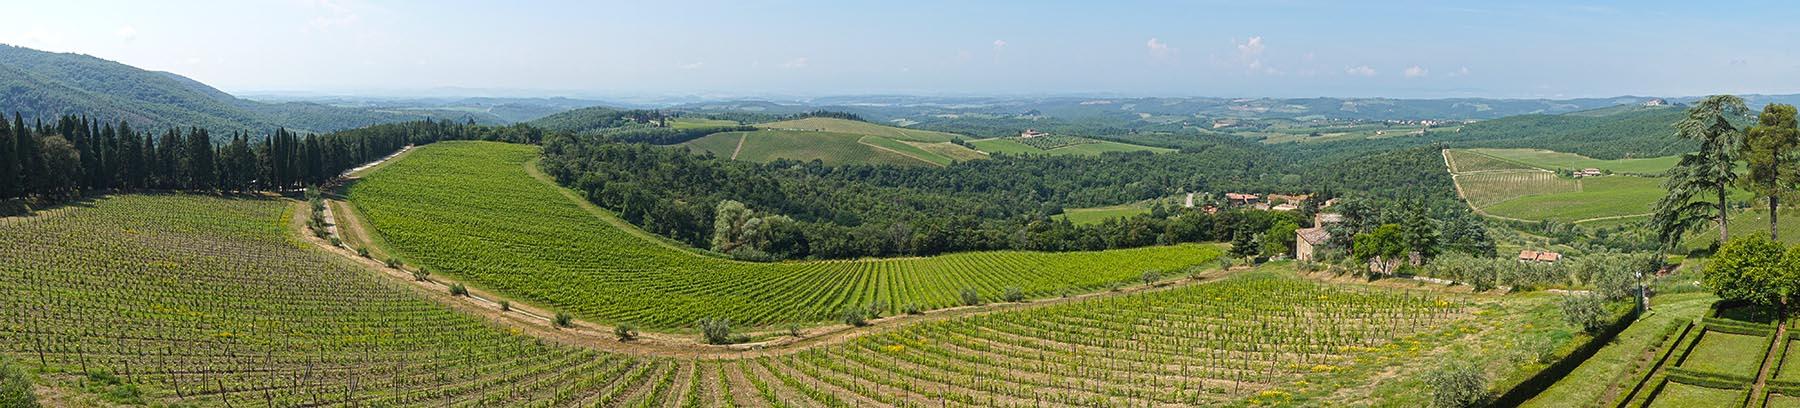 Tuscany landscape at Barone Ricasoli winery